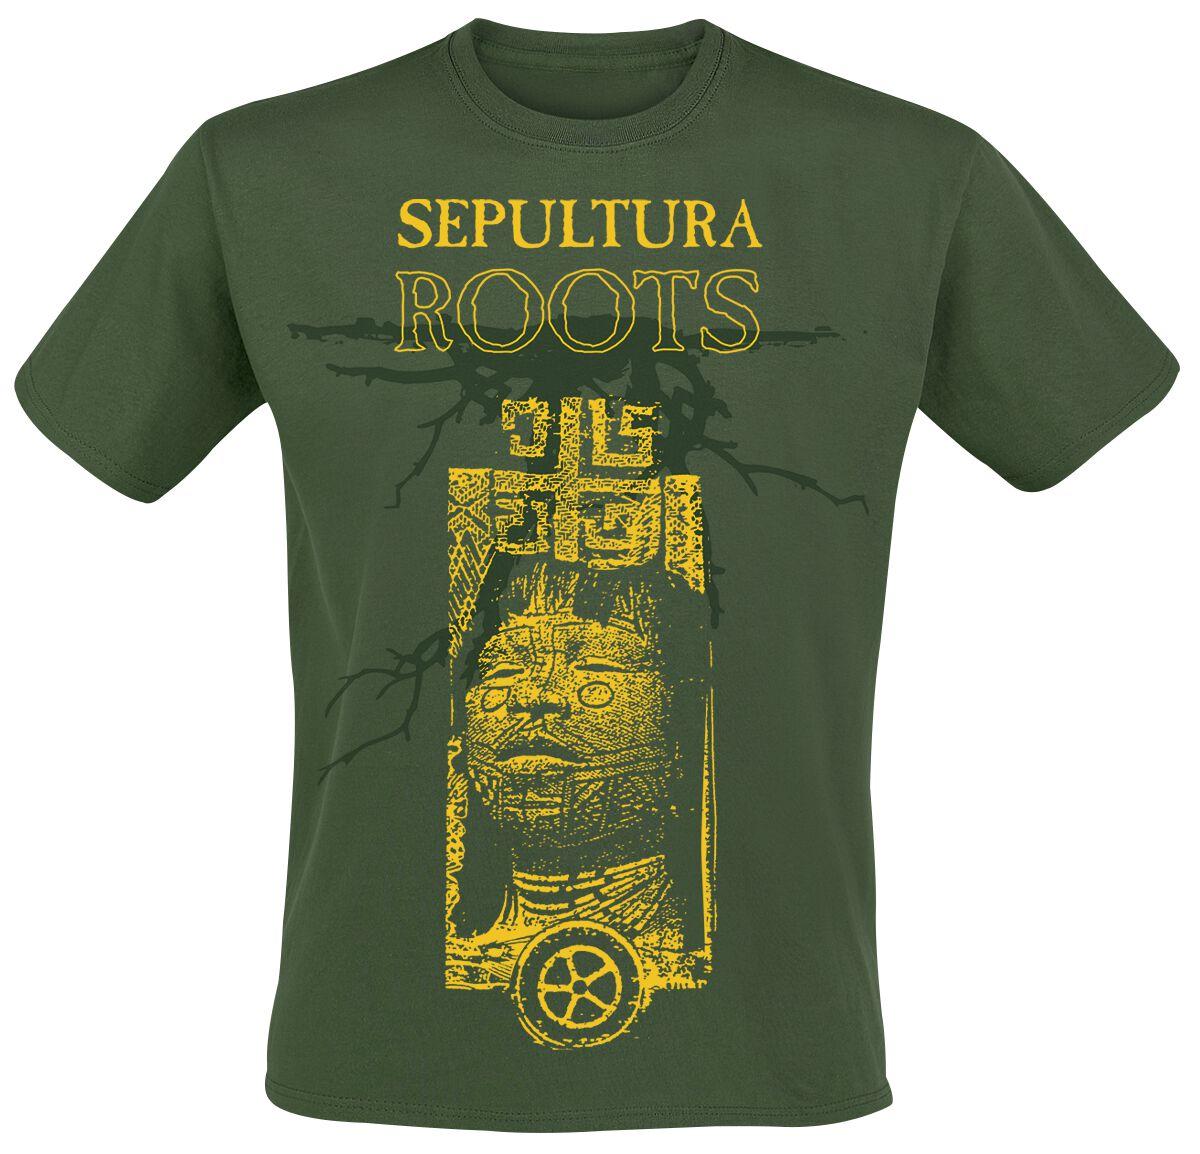 Zespoły - Koszulki - T-Shirt Sepultura Roots 30 Years T-Shirt ciemnozielony - 323485